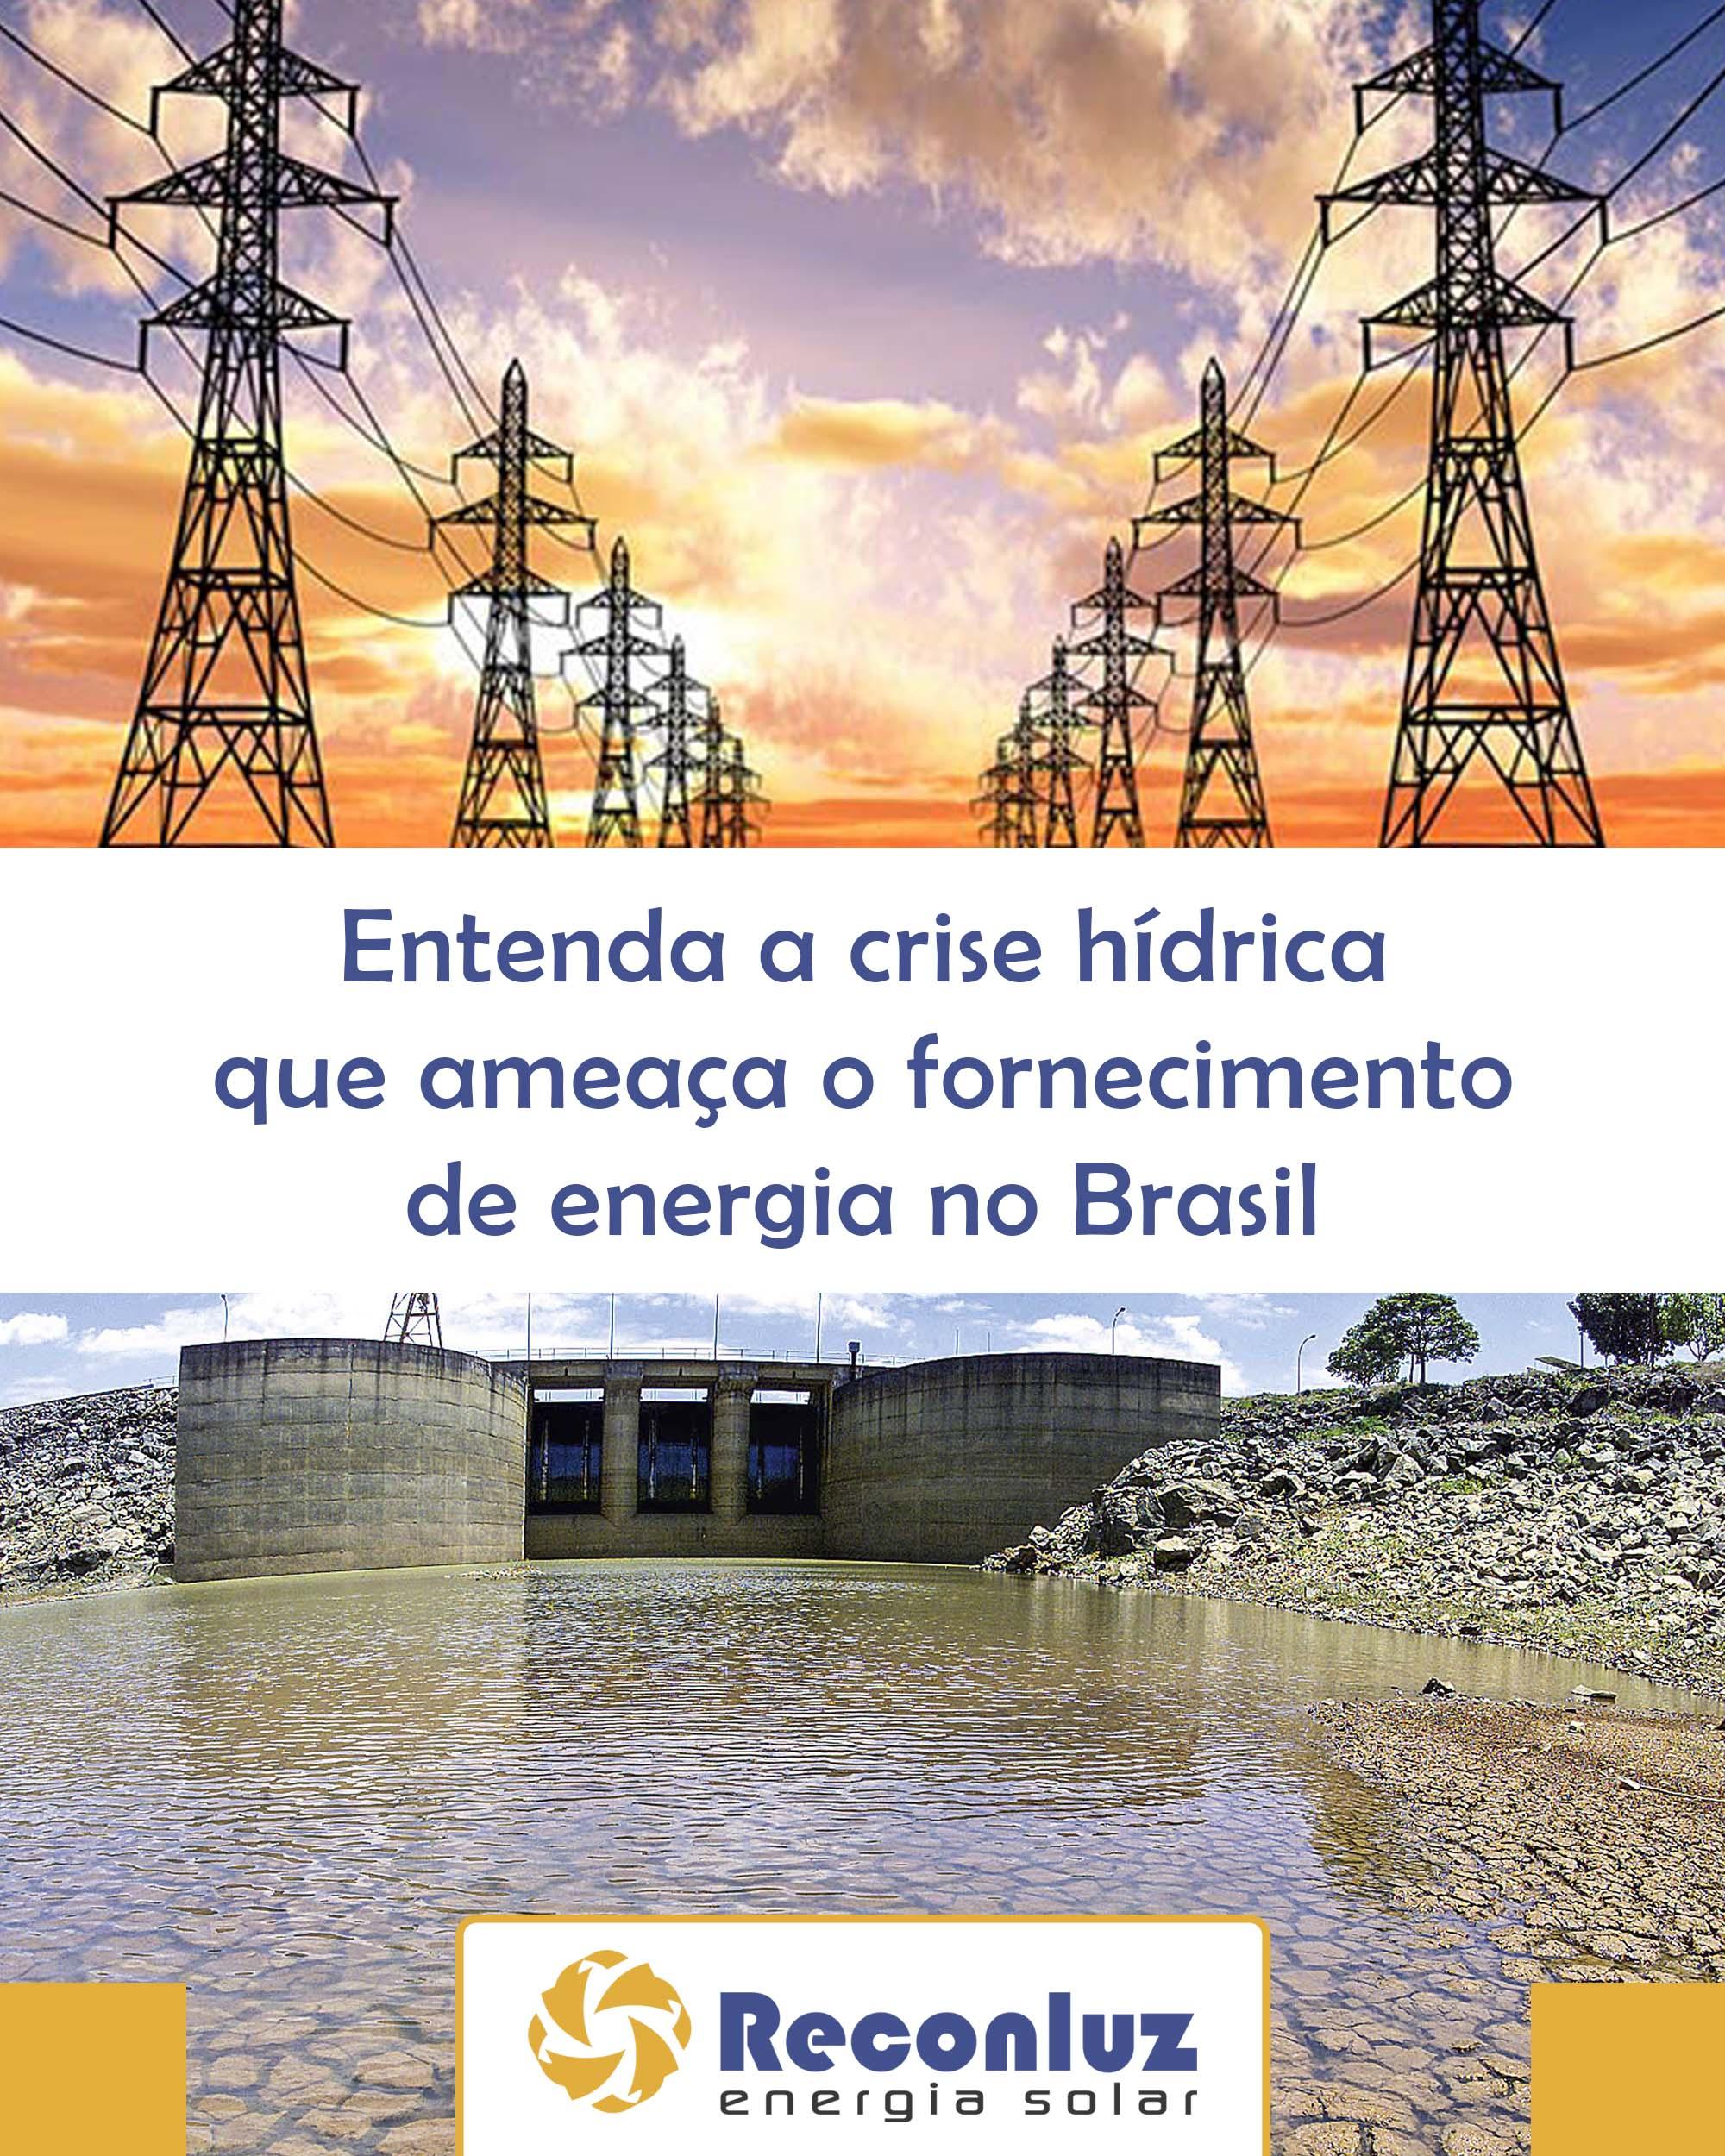 Crise Hídrica no Brasil - Reconluz Energia Solar na Bahia